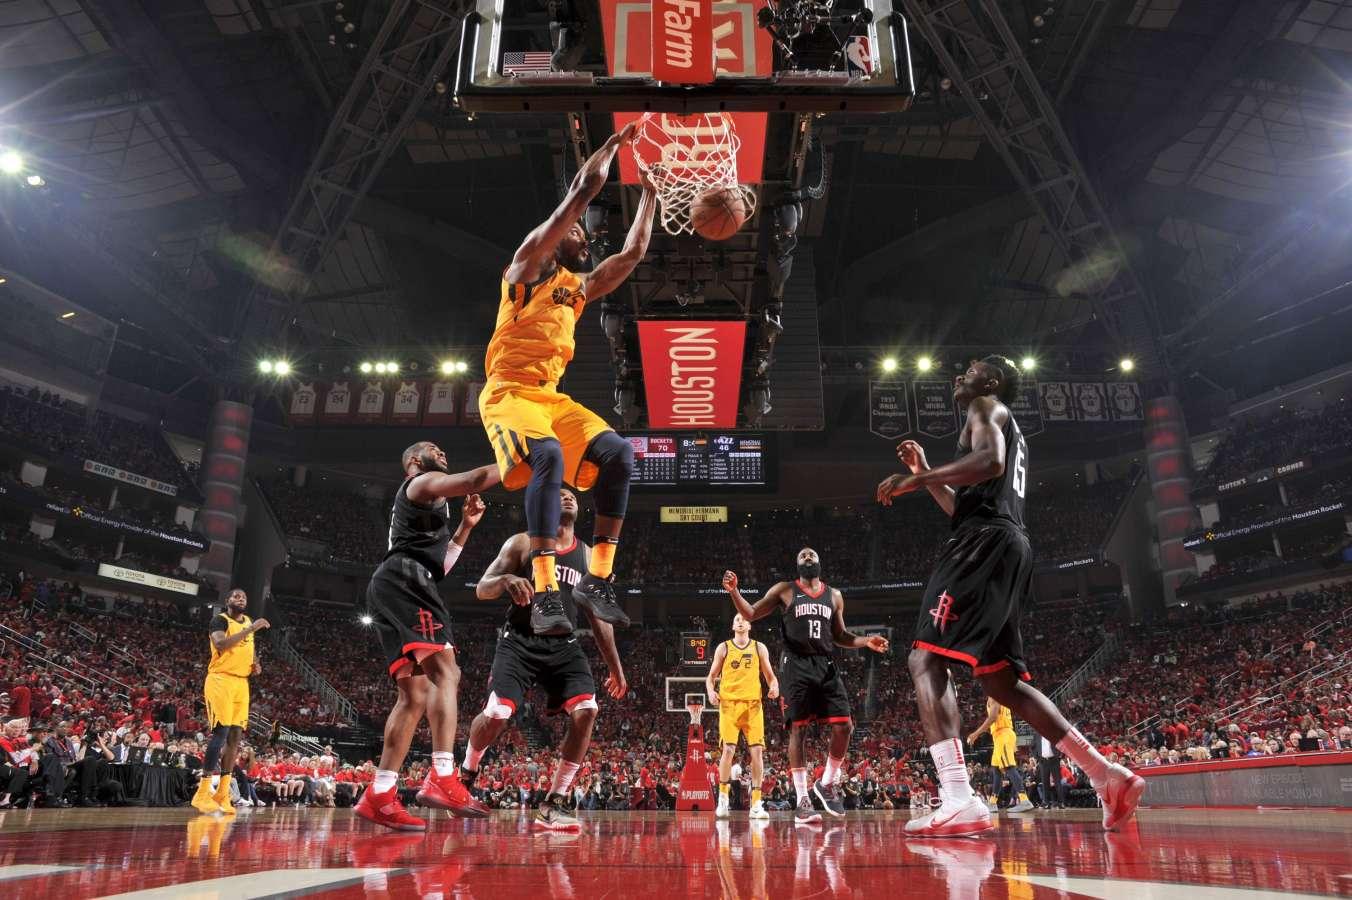 NBA Playoffs Thursday May 2: Rockets vs Jazz Betting Tips